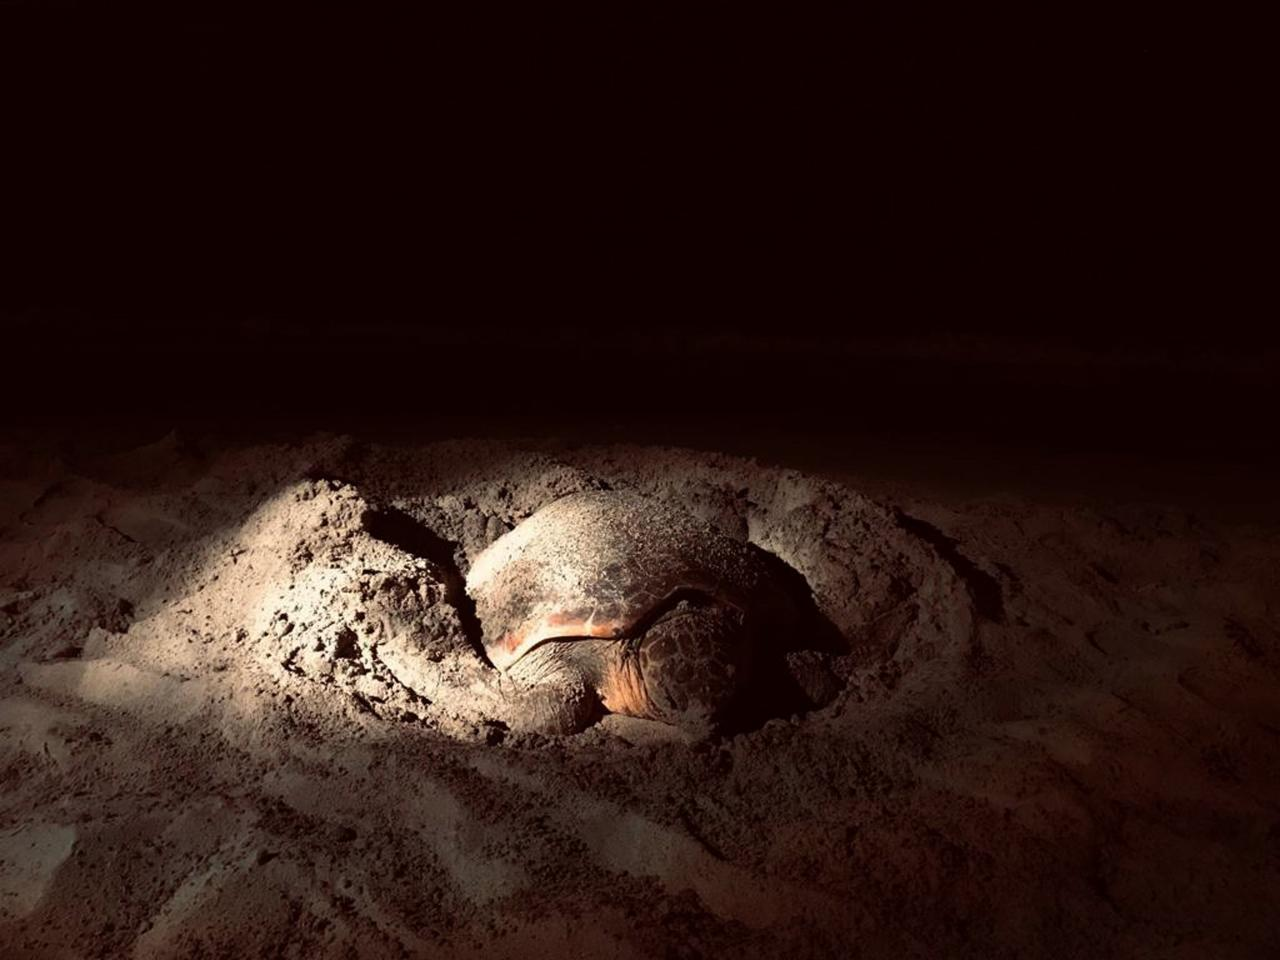 La Policía Local protege el desove de una tortuga en Platja d'en Bossa